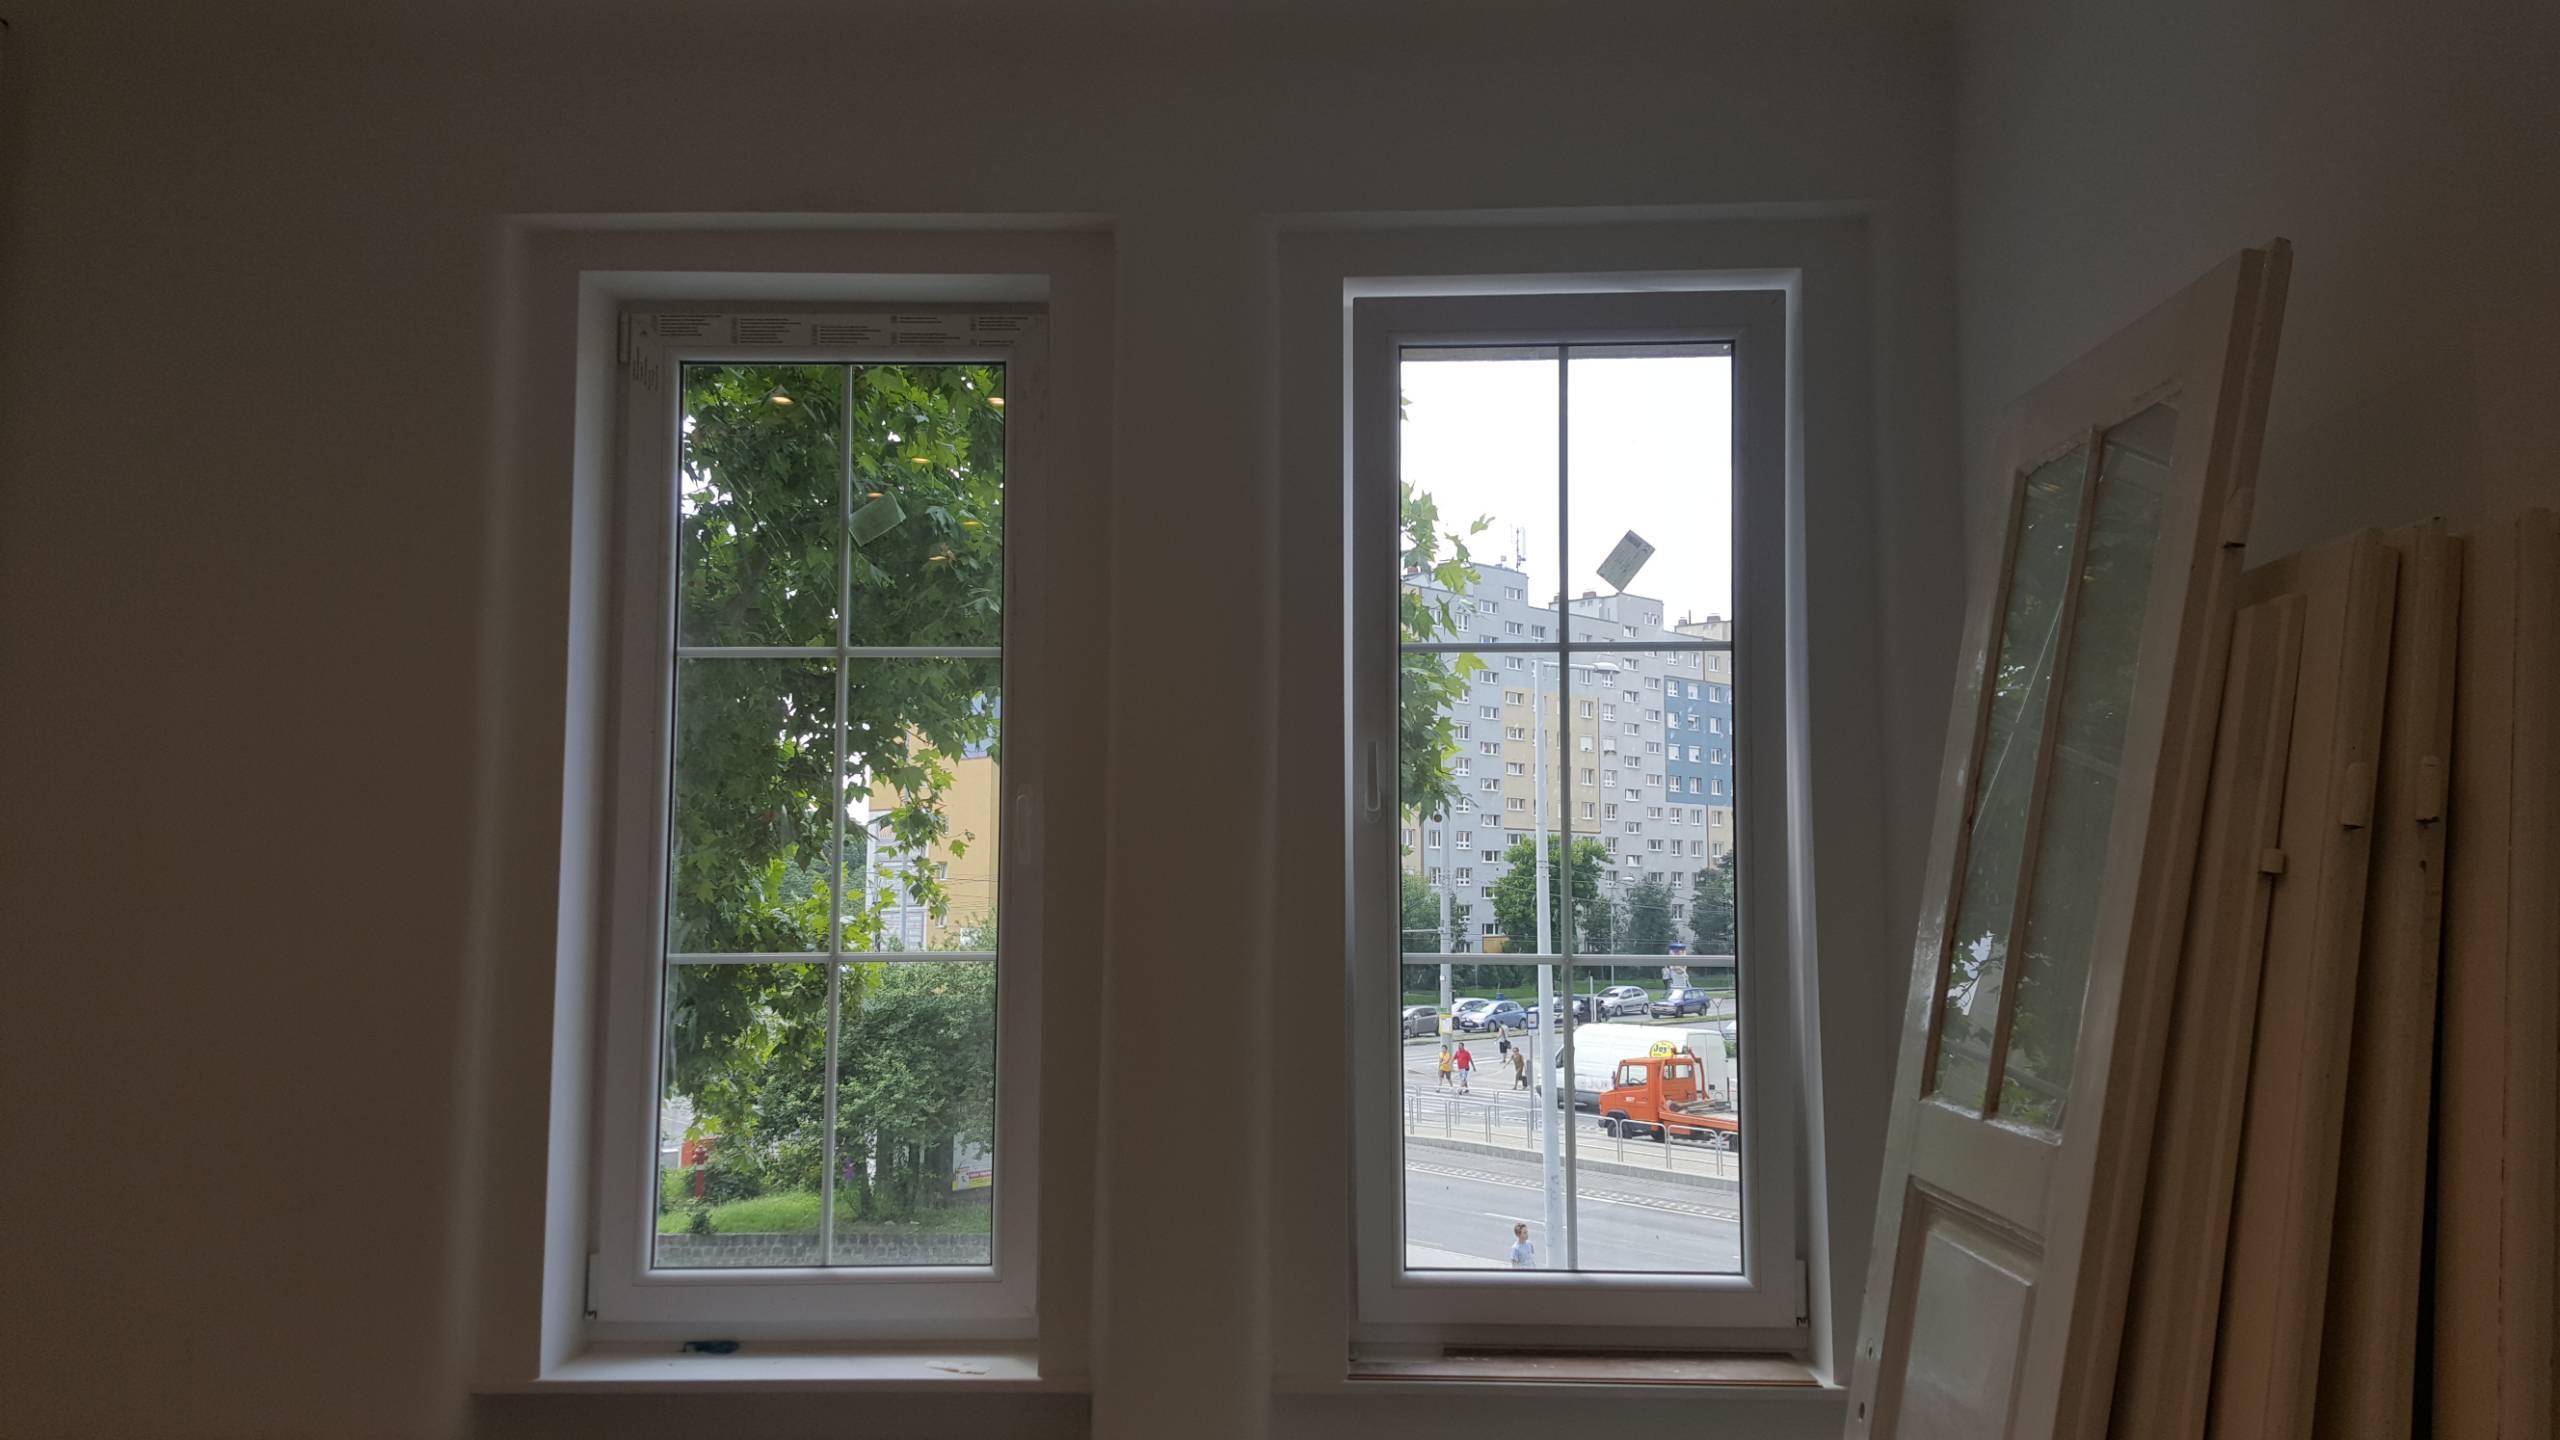 uj ablakok